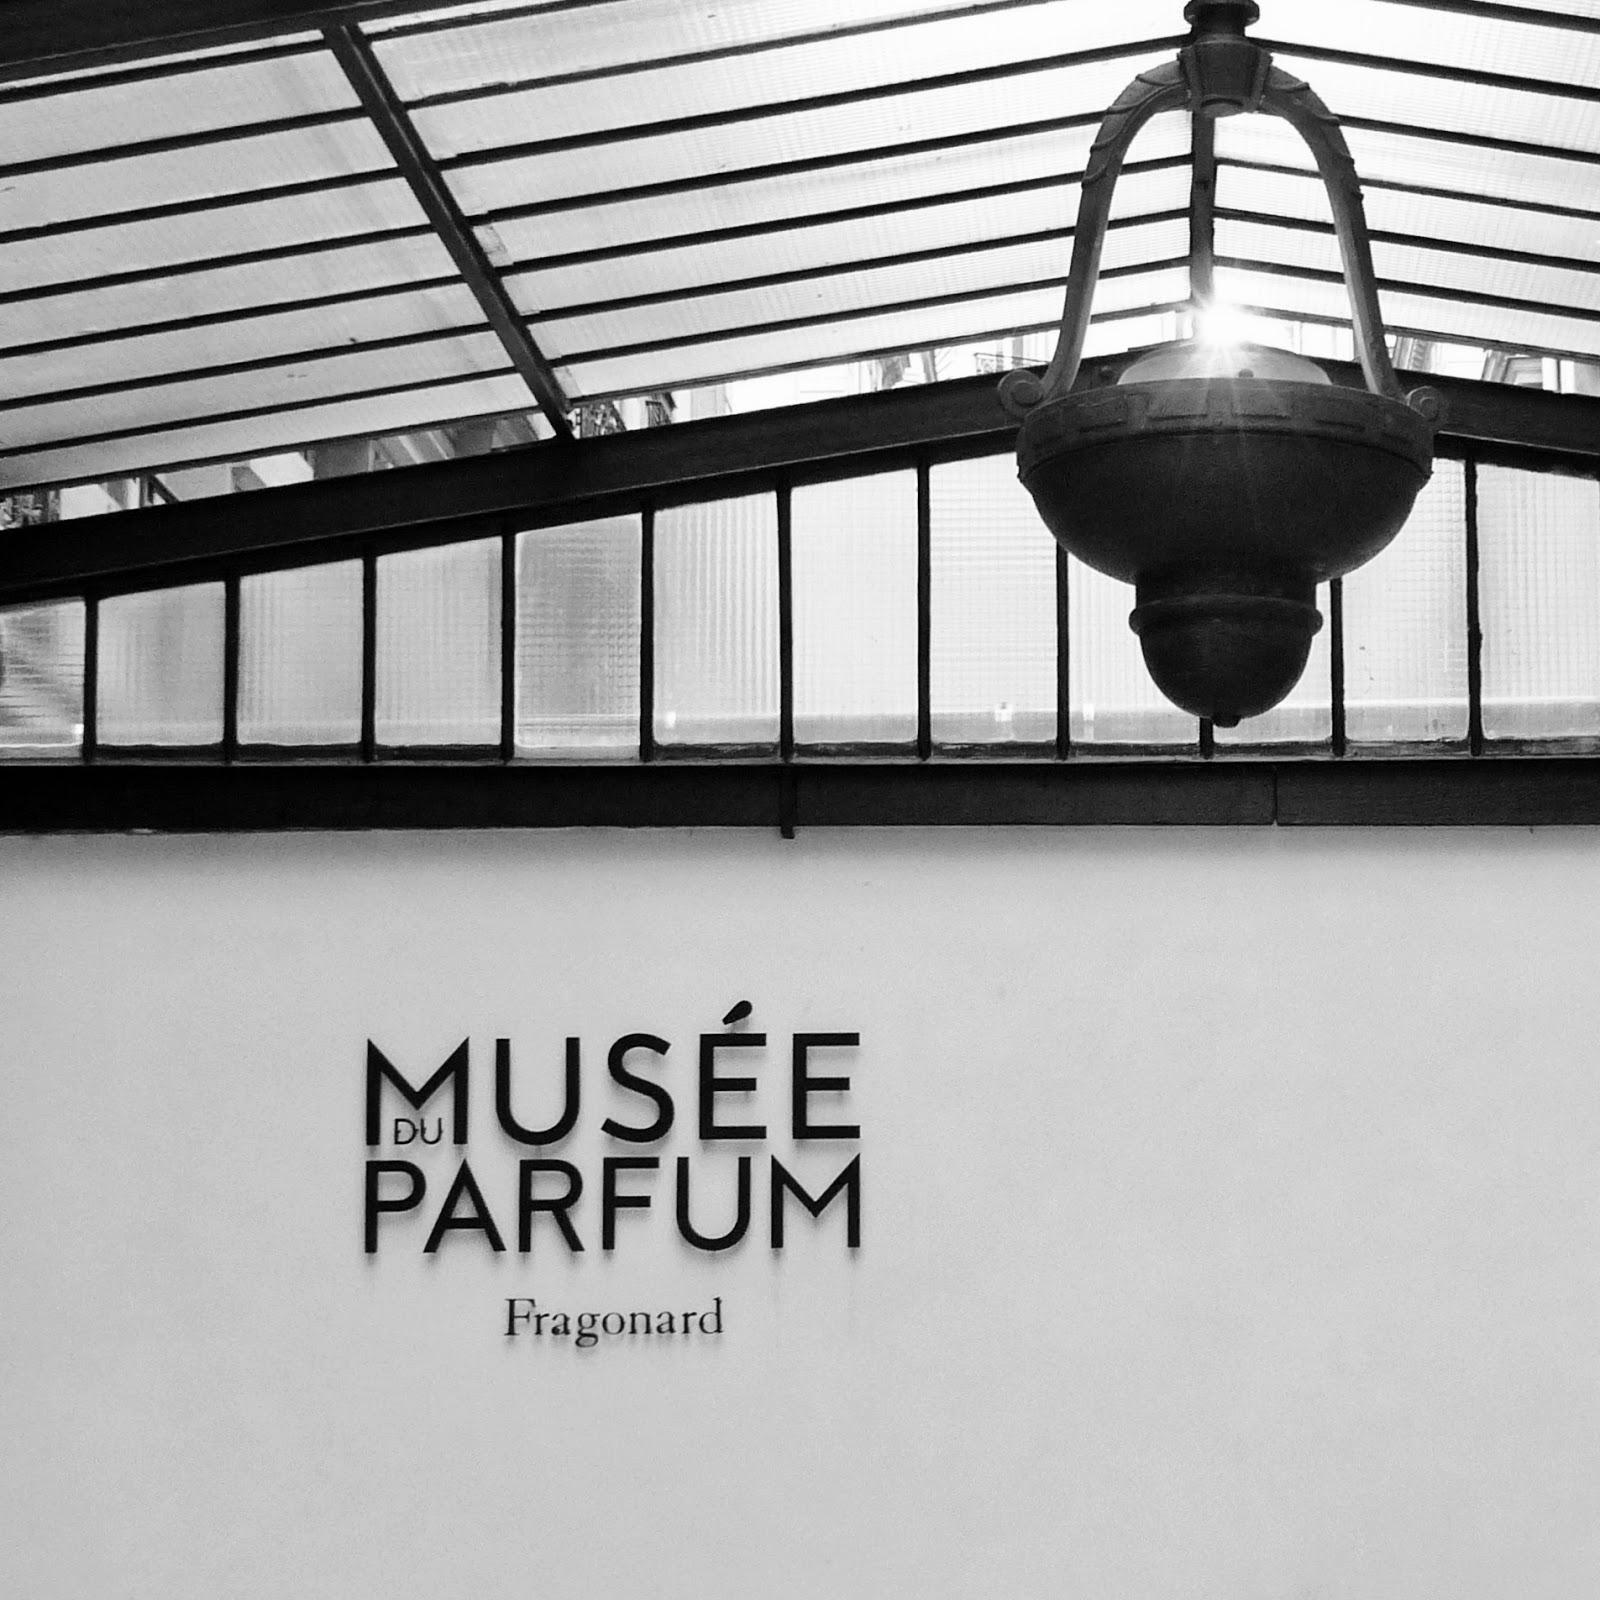 Stephan matthews - Fragonard musee du parfum ...